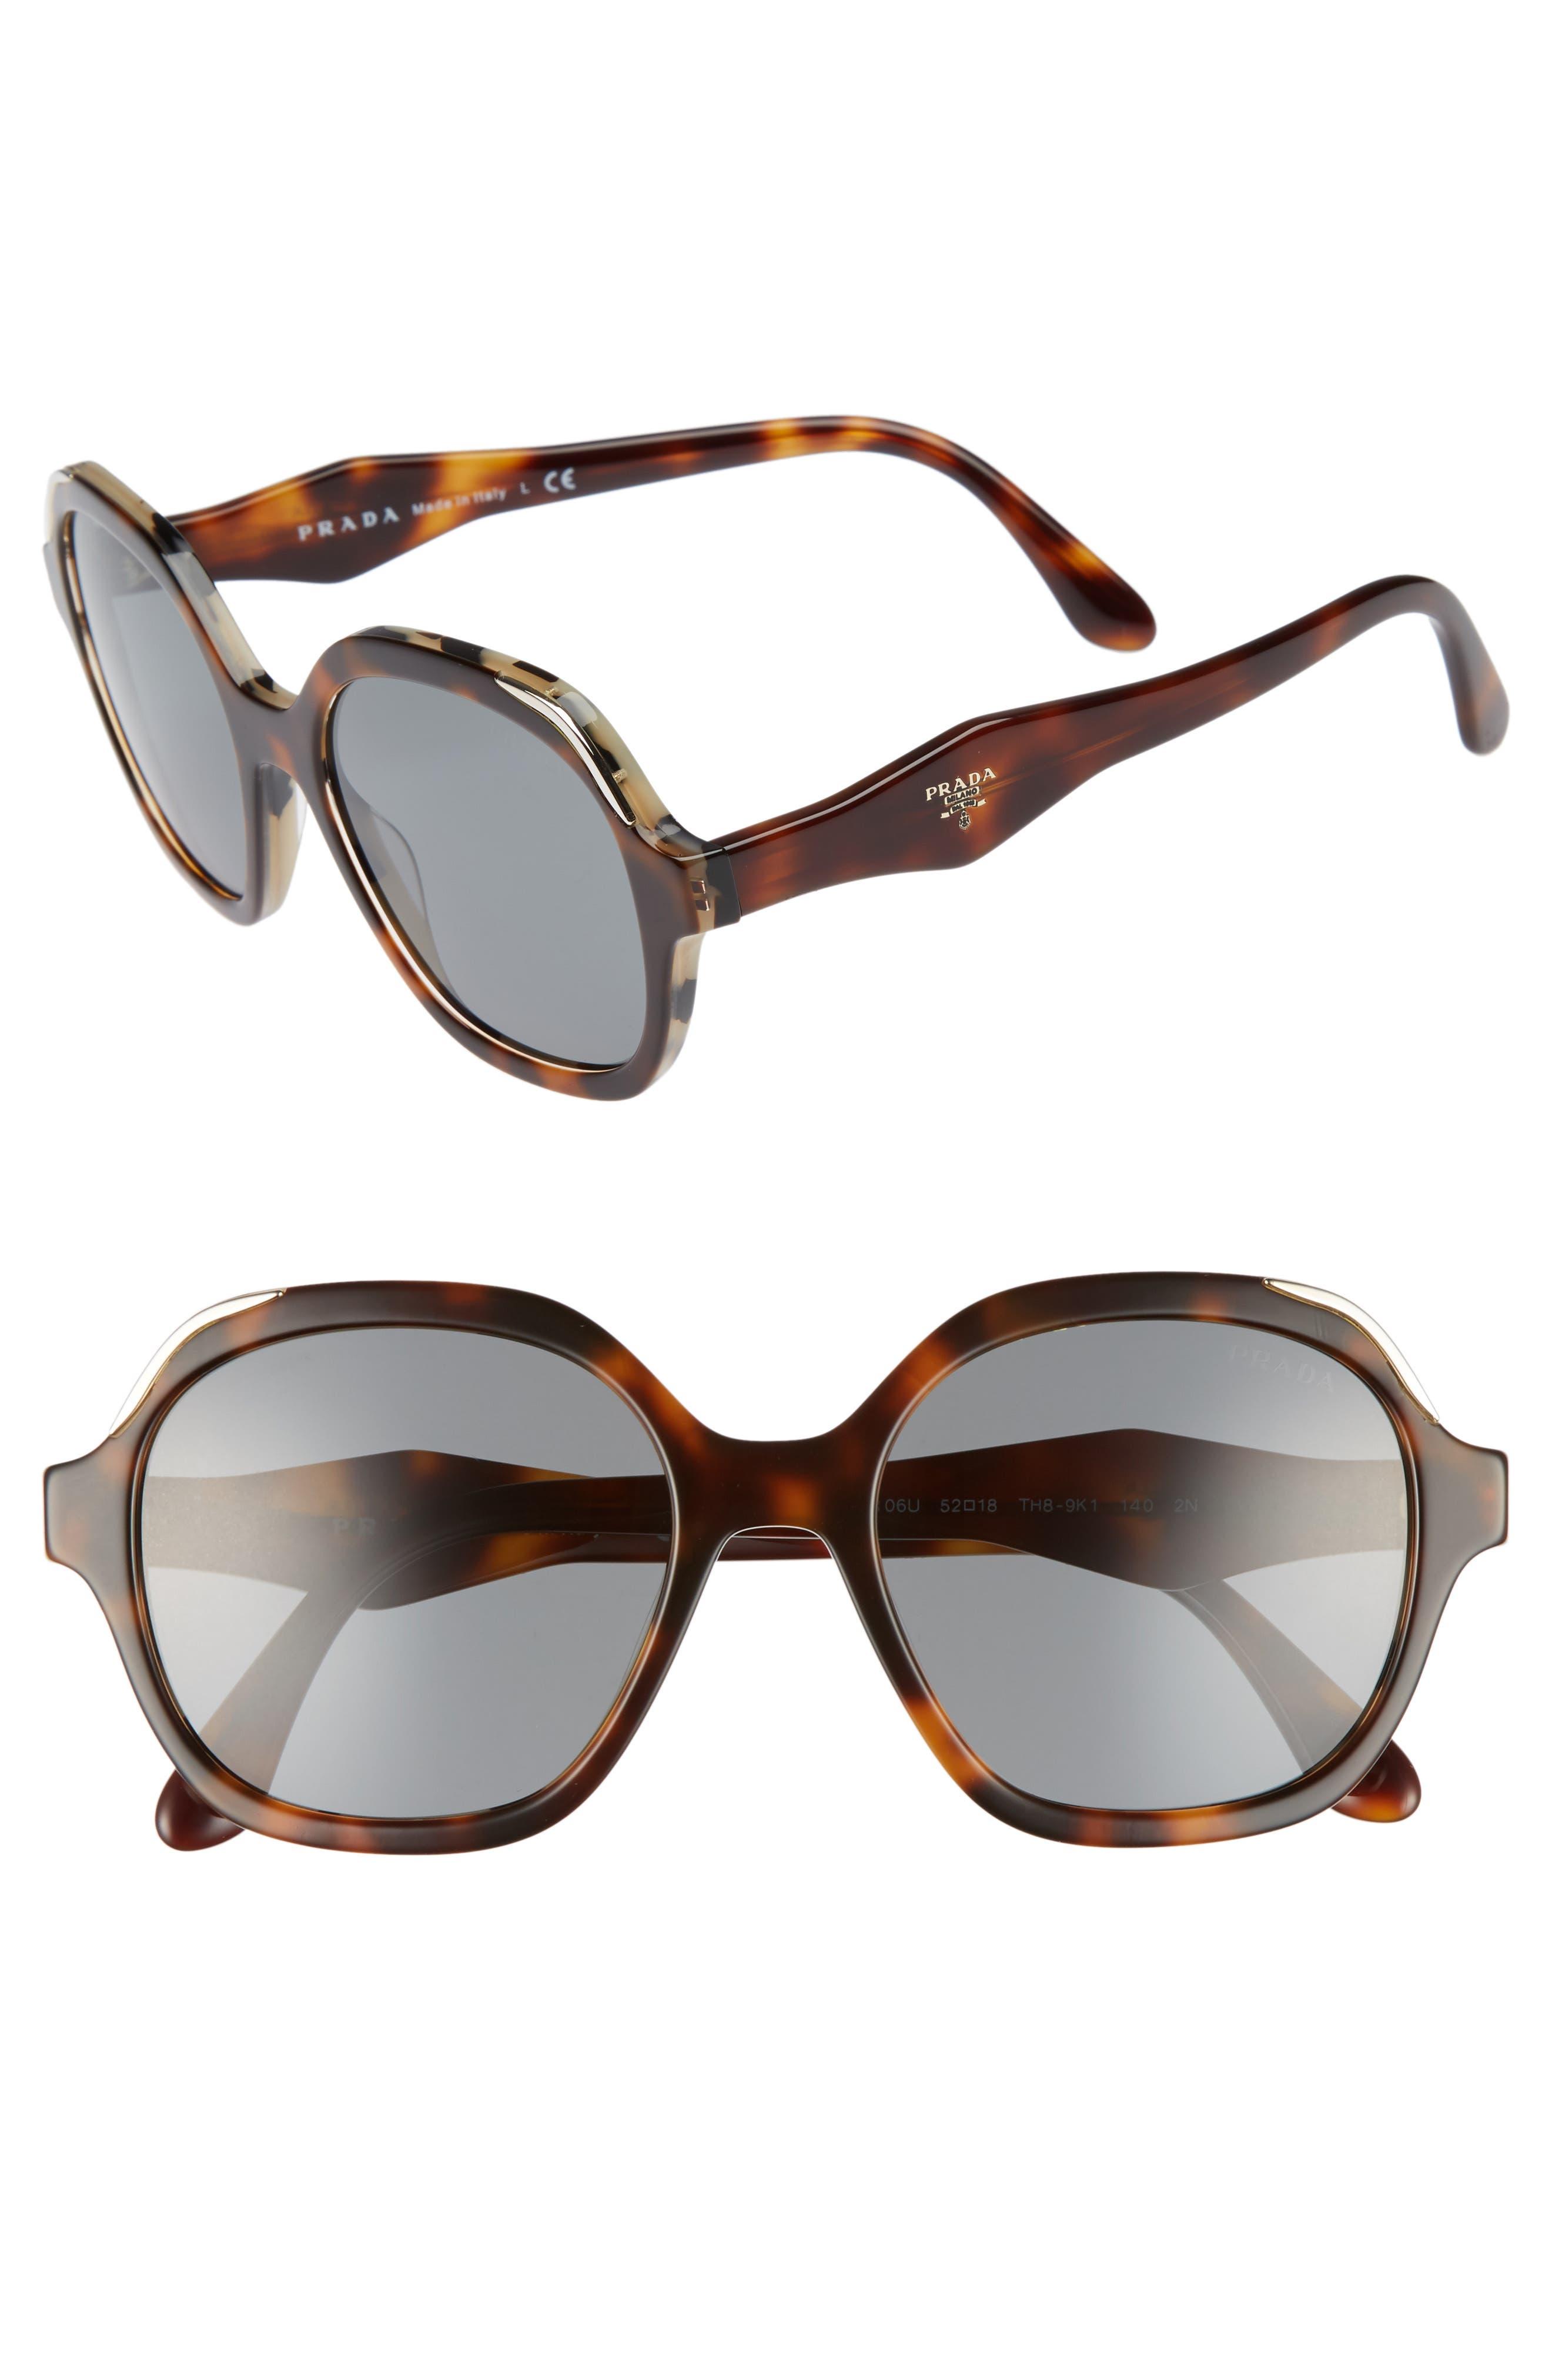 50mm Square Sunglasses,                         Main,                         color, White/ Havana